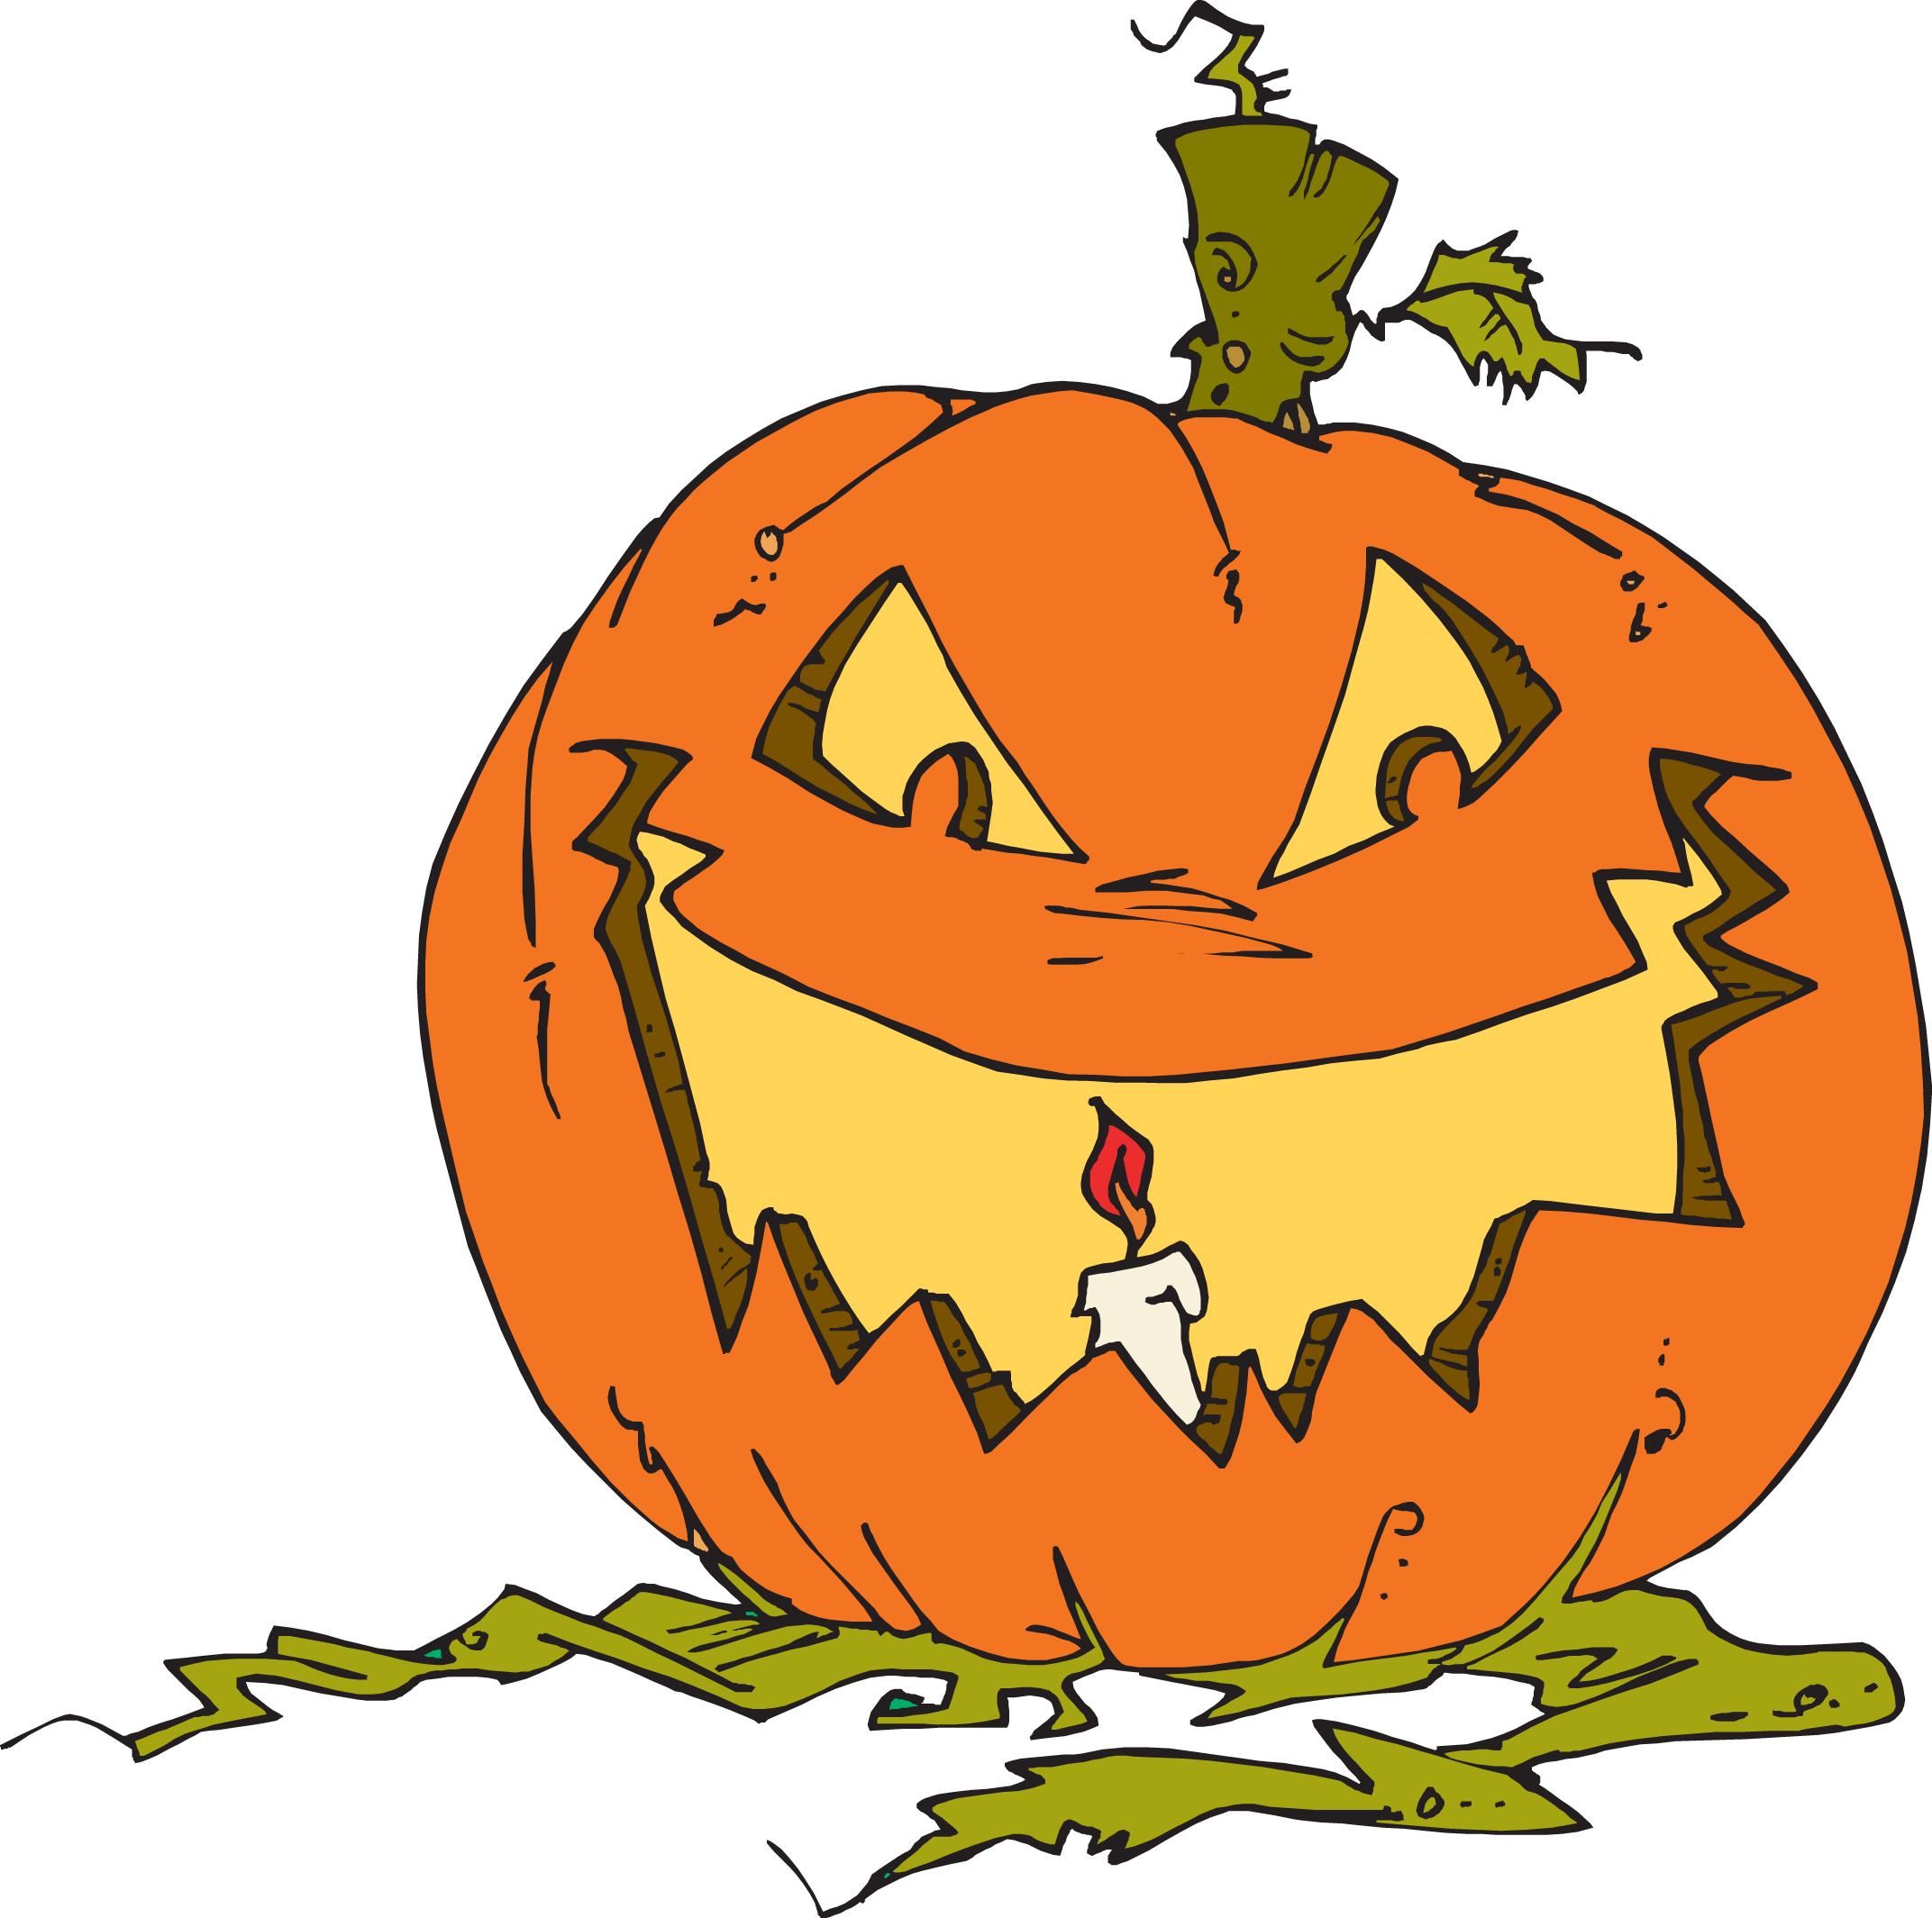 Jack-o'-lantern clipart #1, Download drawings